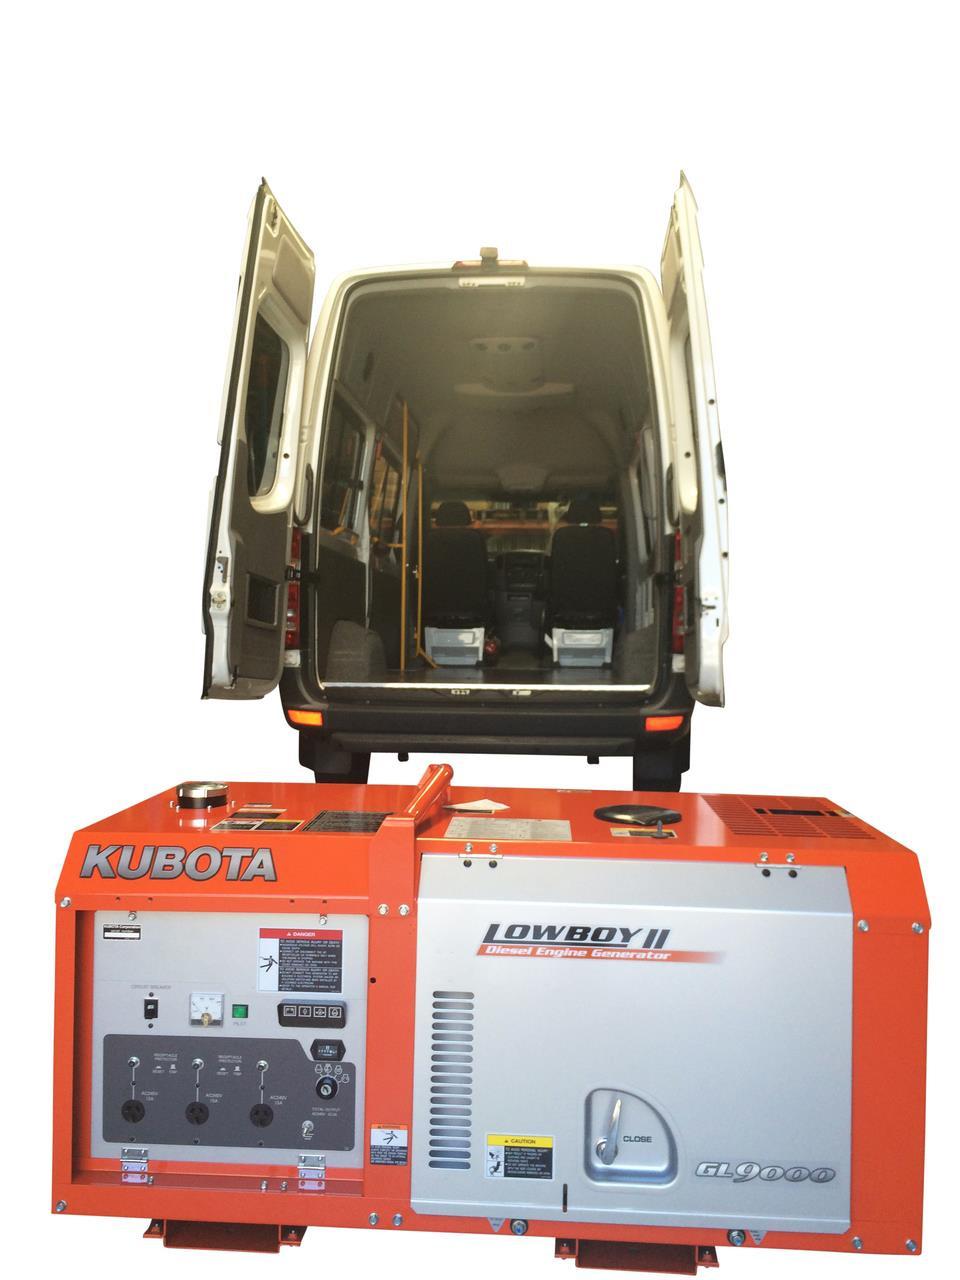 Kubota Generator for Mobile Food Van or Coffee Van Setup